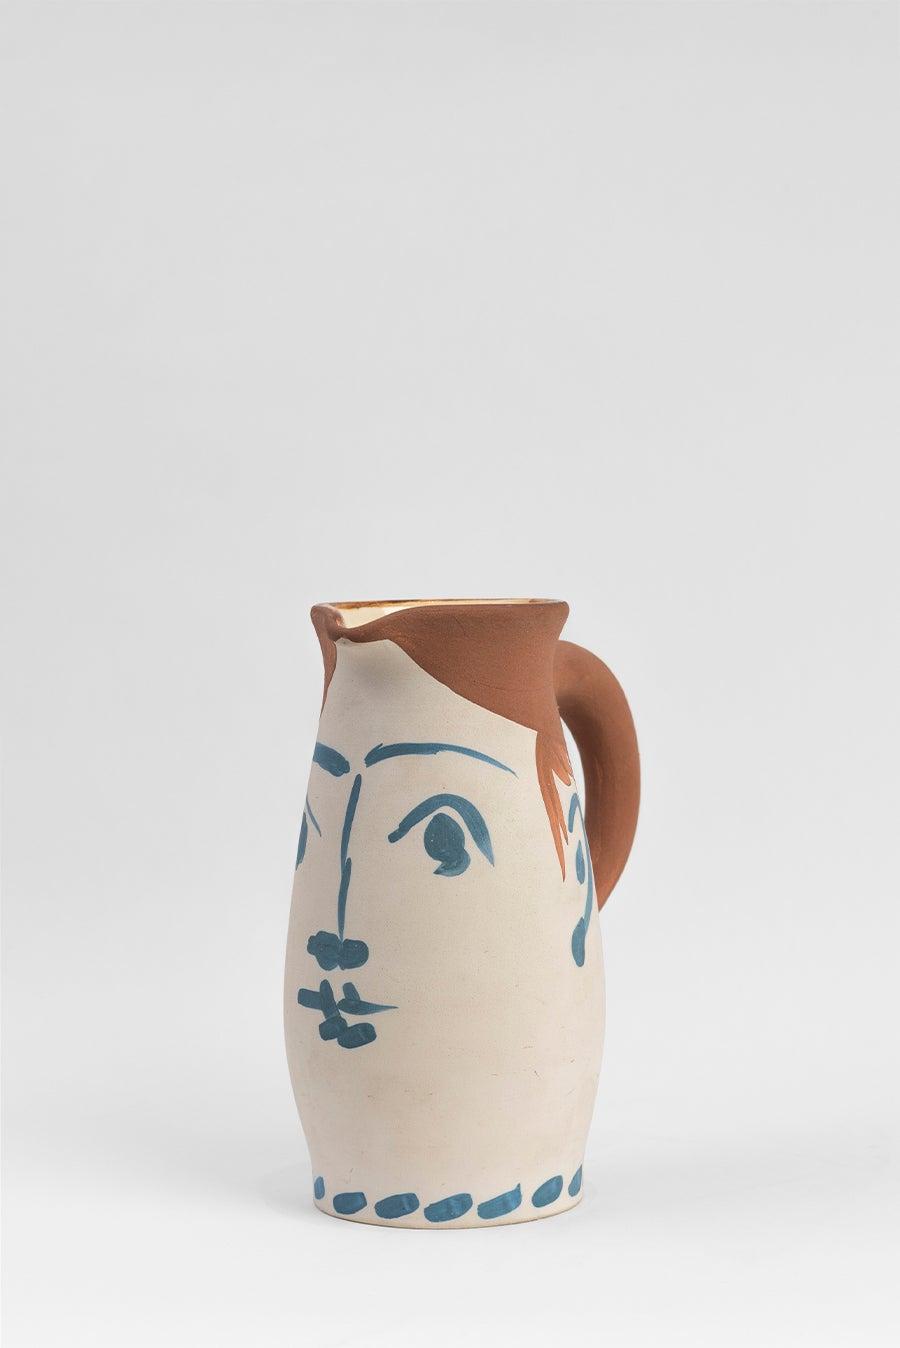 Pablo Picasso - Madoura Ceramic: Face Tankard (Chope visage)